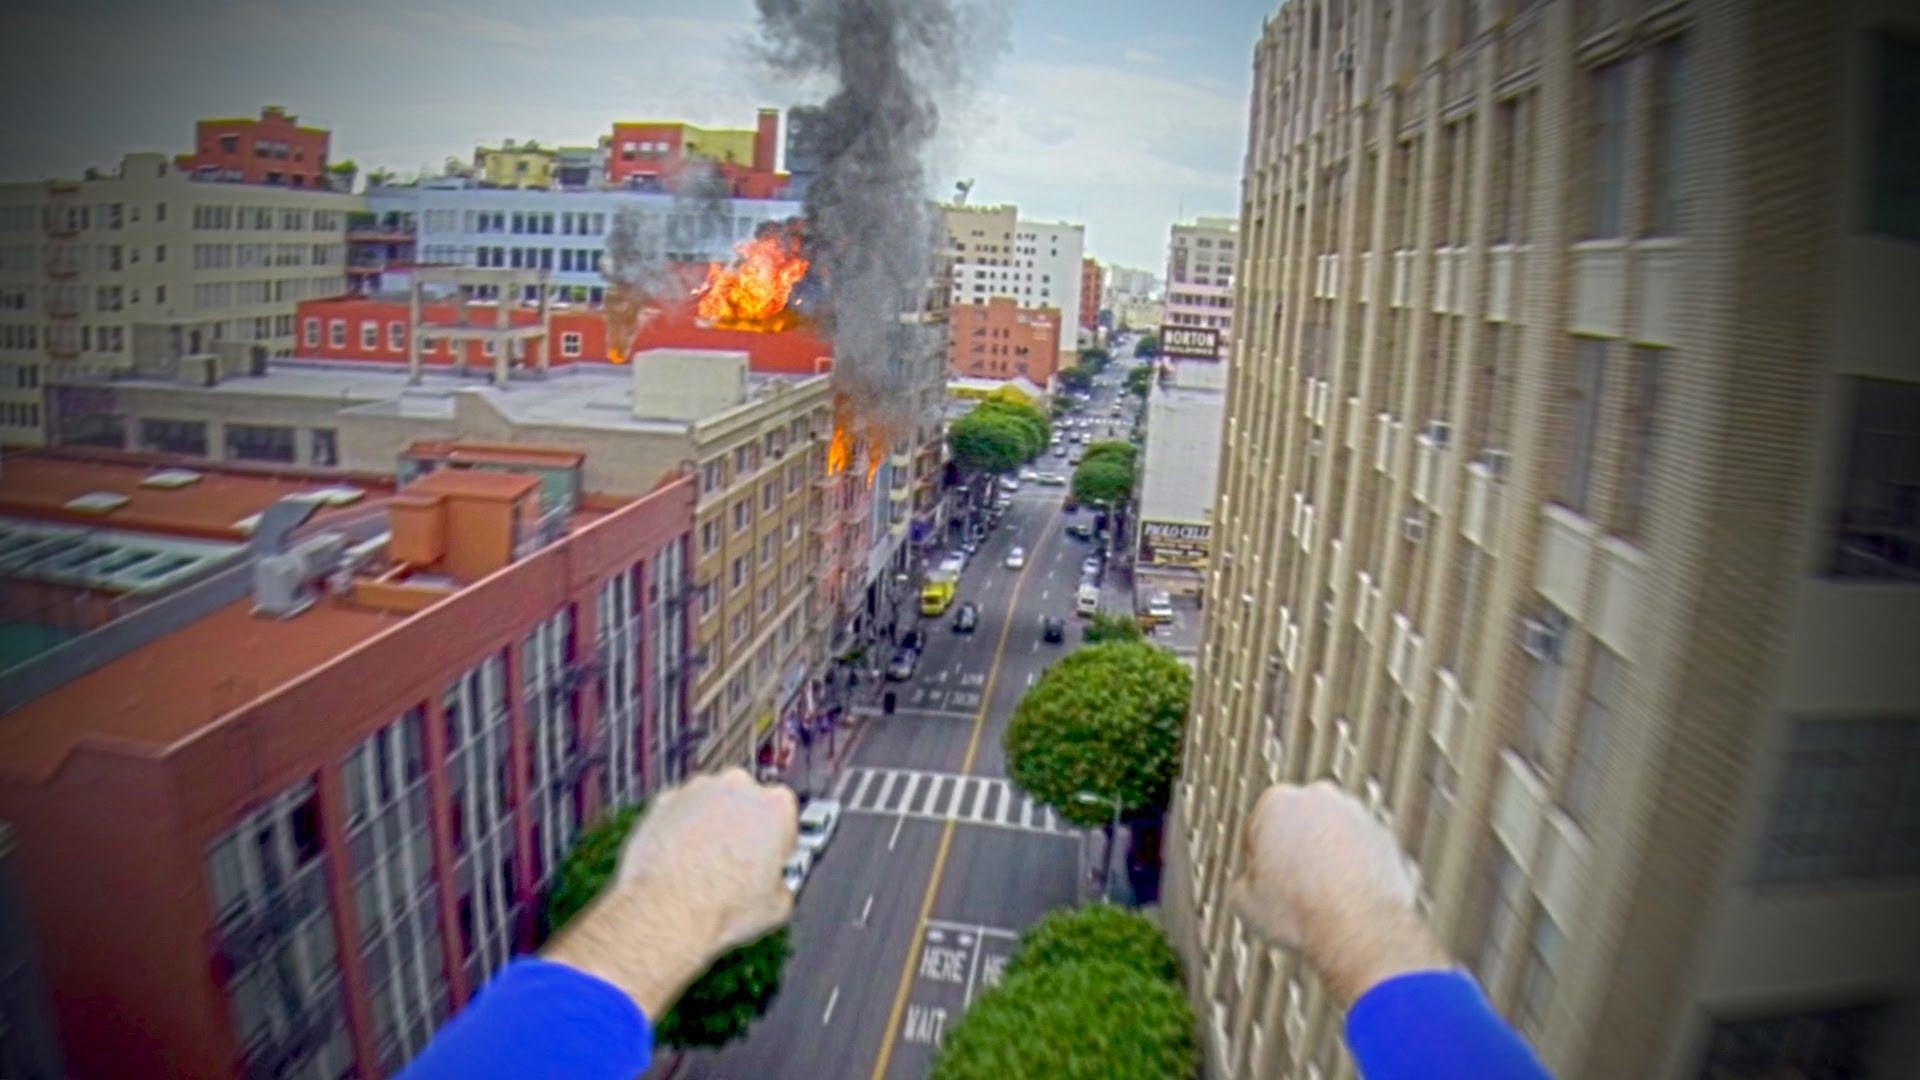 Мир глазами Супермена. Съемка GoPro камерой